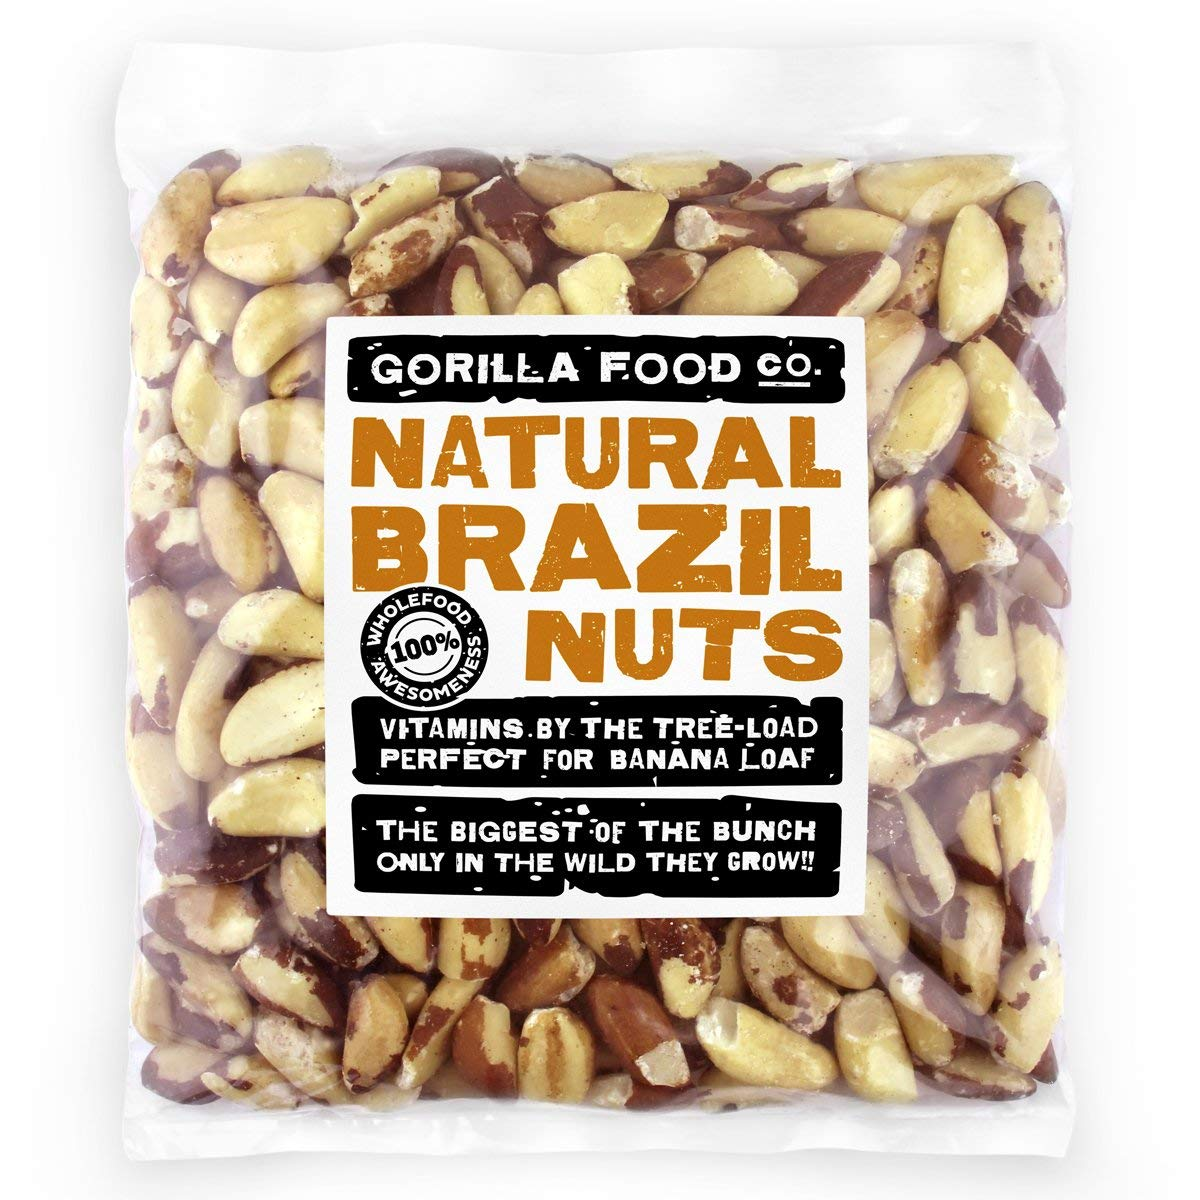 Premium Brazil Nuts Raw Whole Resealable Daily bargain sale 2Lb Bag - Ultra-Cheap Deals